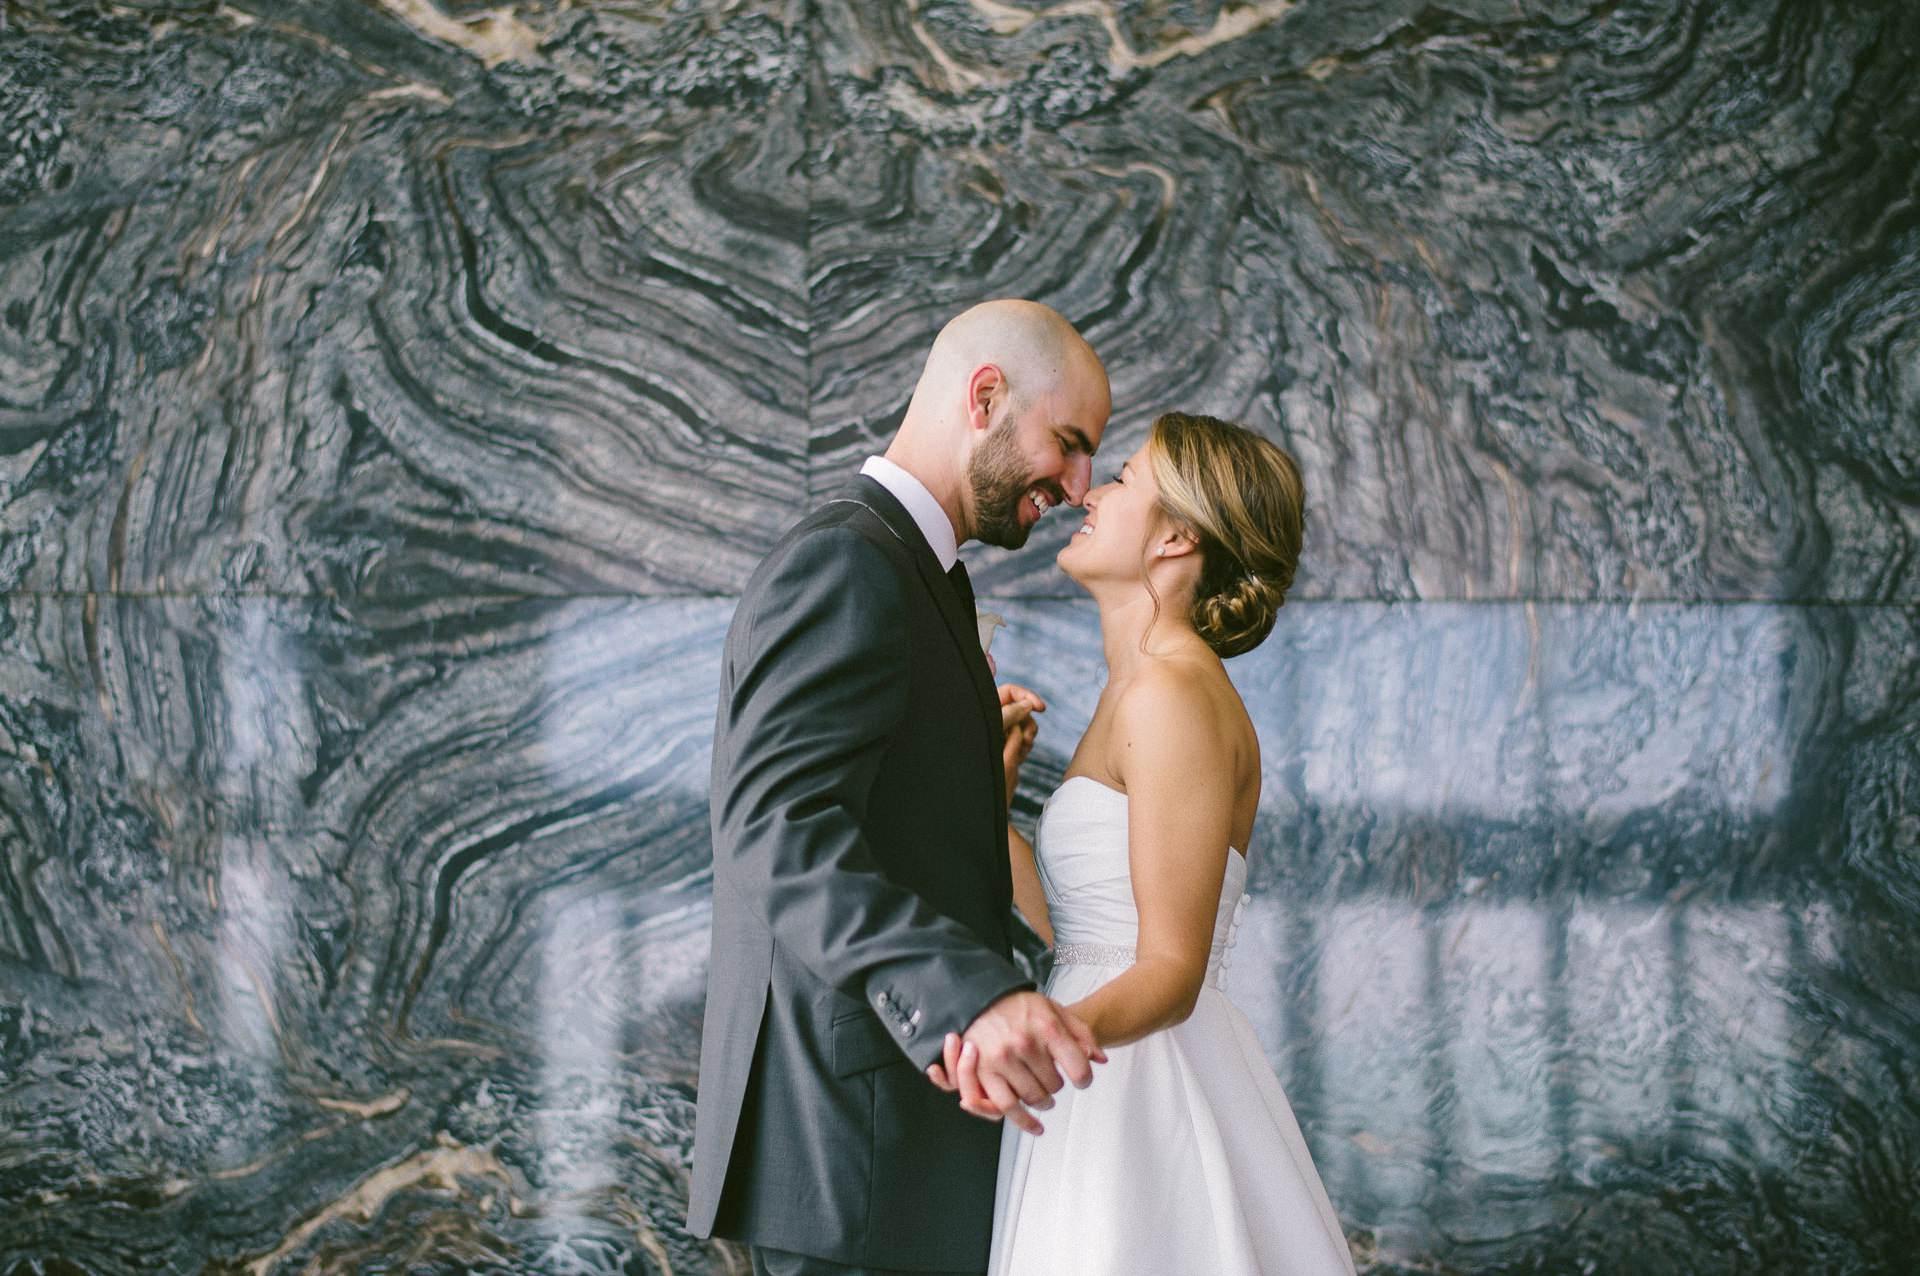 Dowtown Hilton Cleveland Wedding Photographer 1 34.jpg